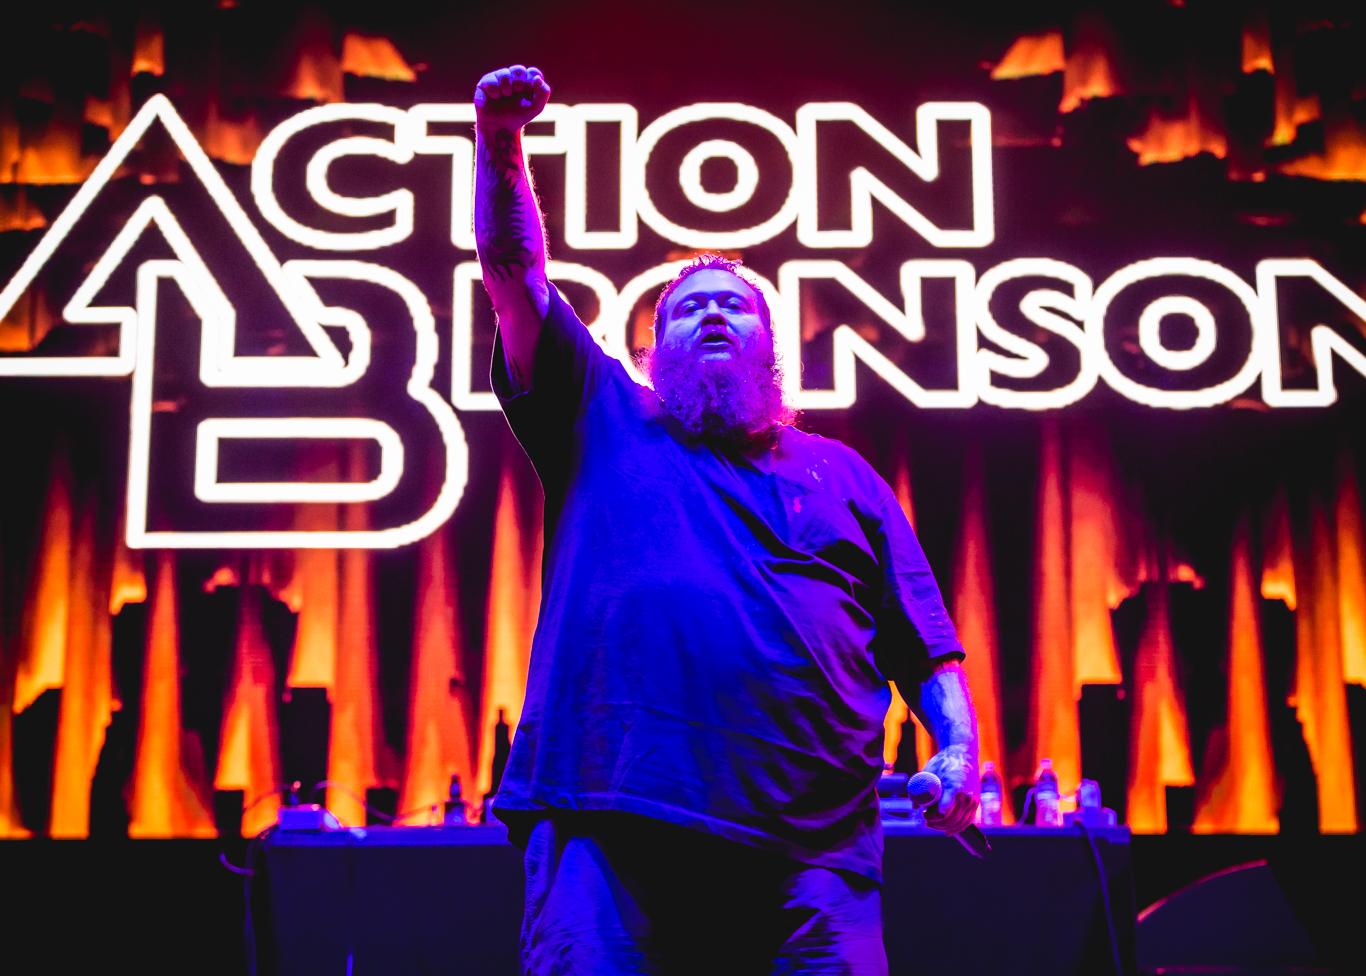 20161114_ACTIONBRONSON-1.jpg